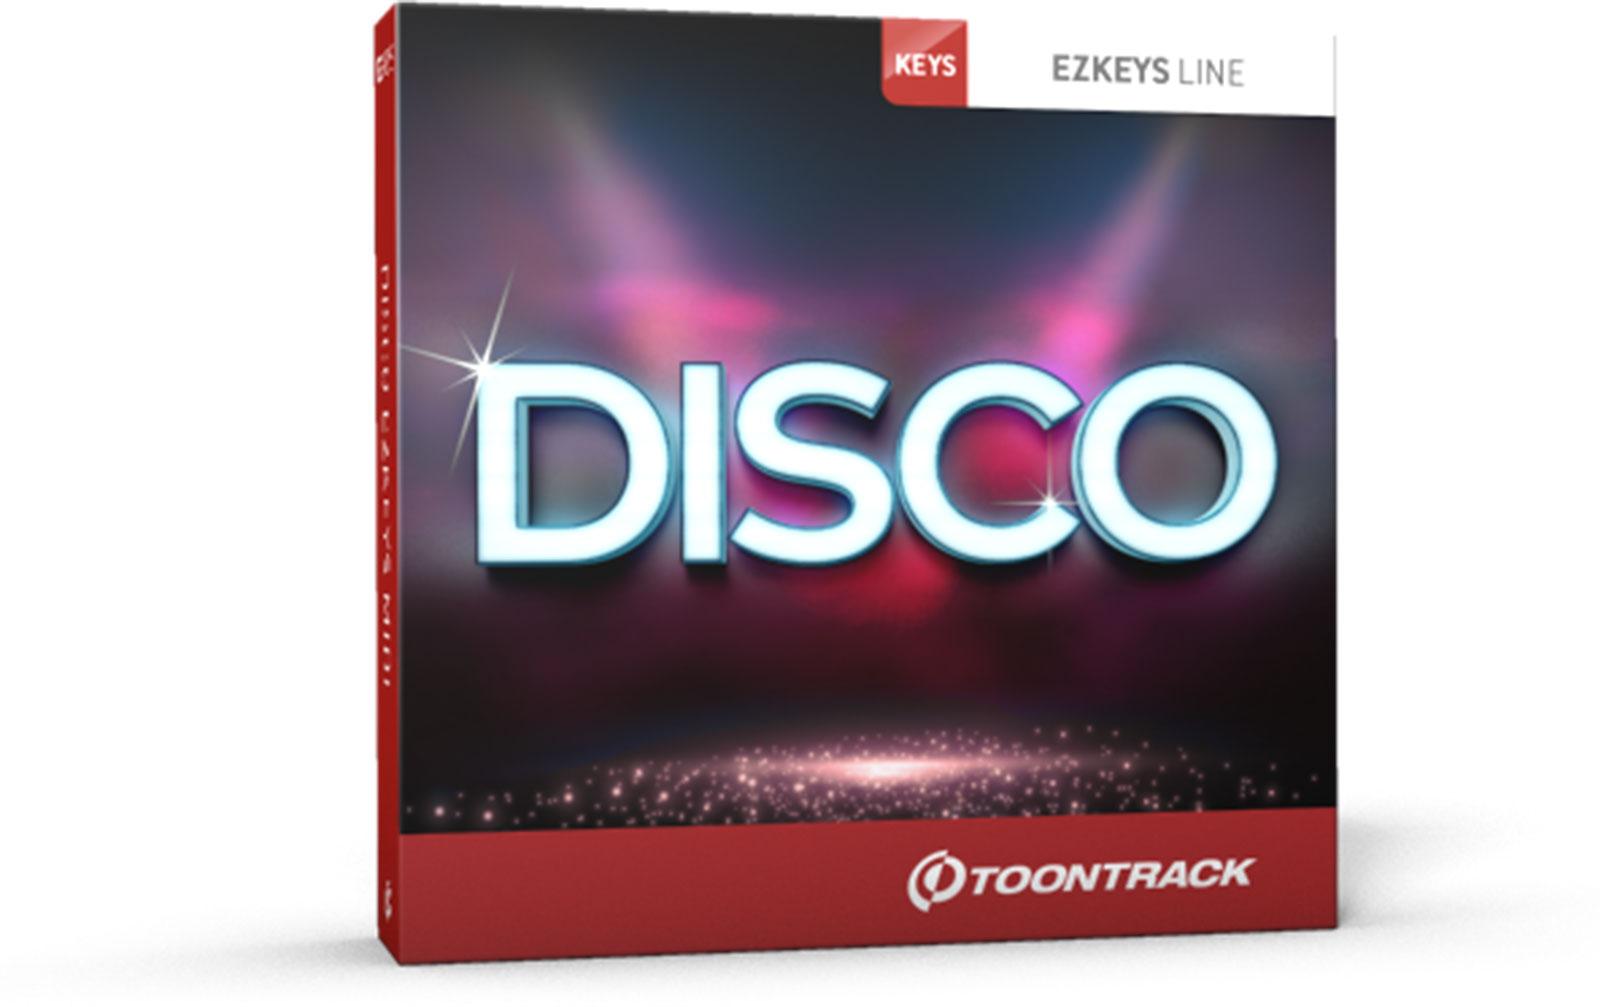 toontrack-ezkeys-disco-midi-pack-download-